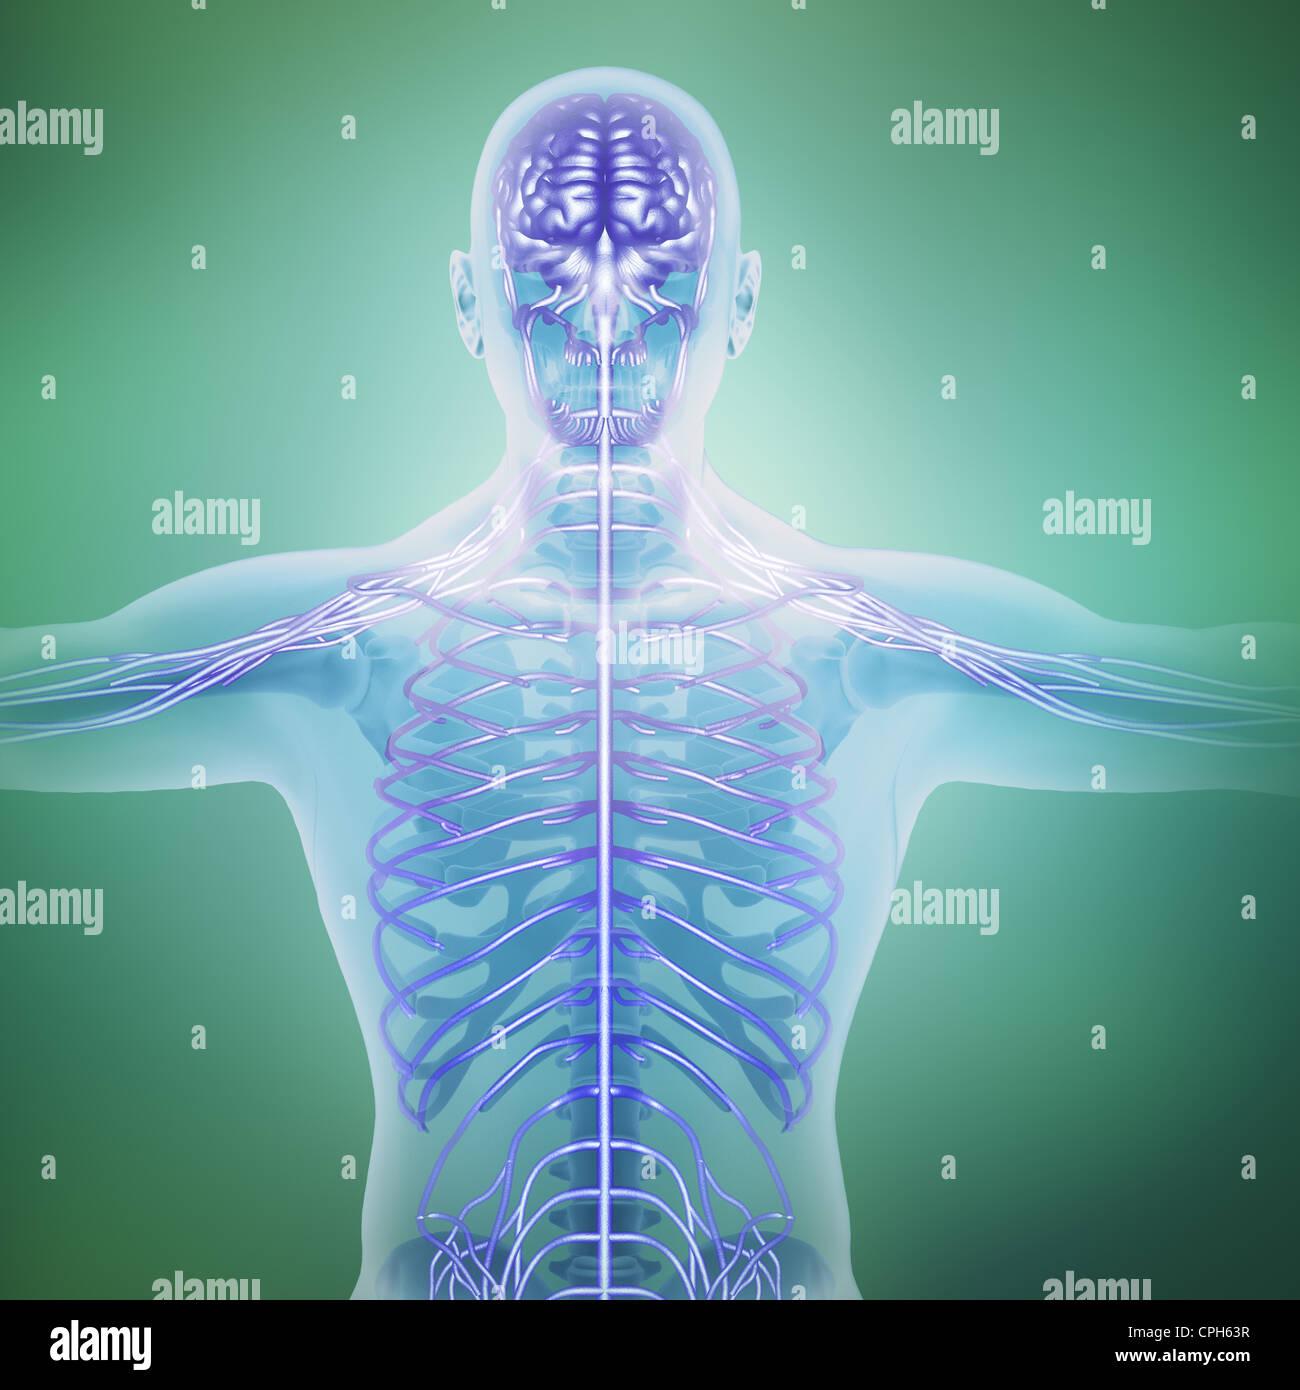 L'anatomie humaine illustration - système nerveux central Photo Stock